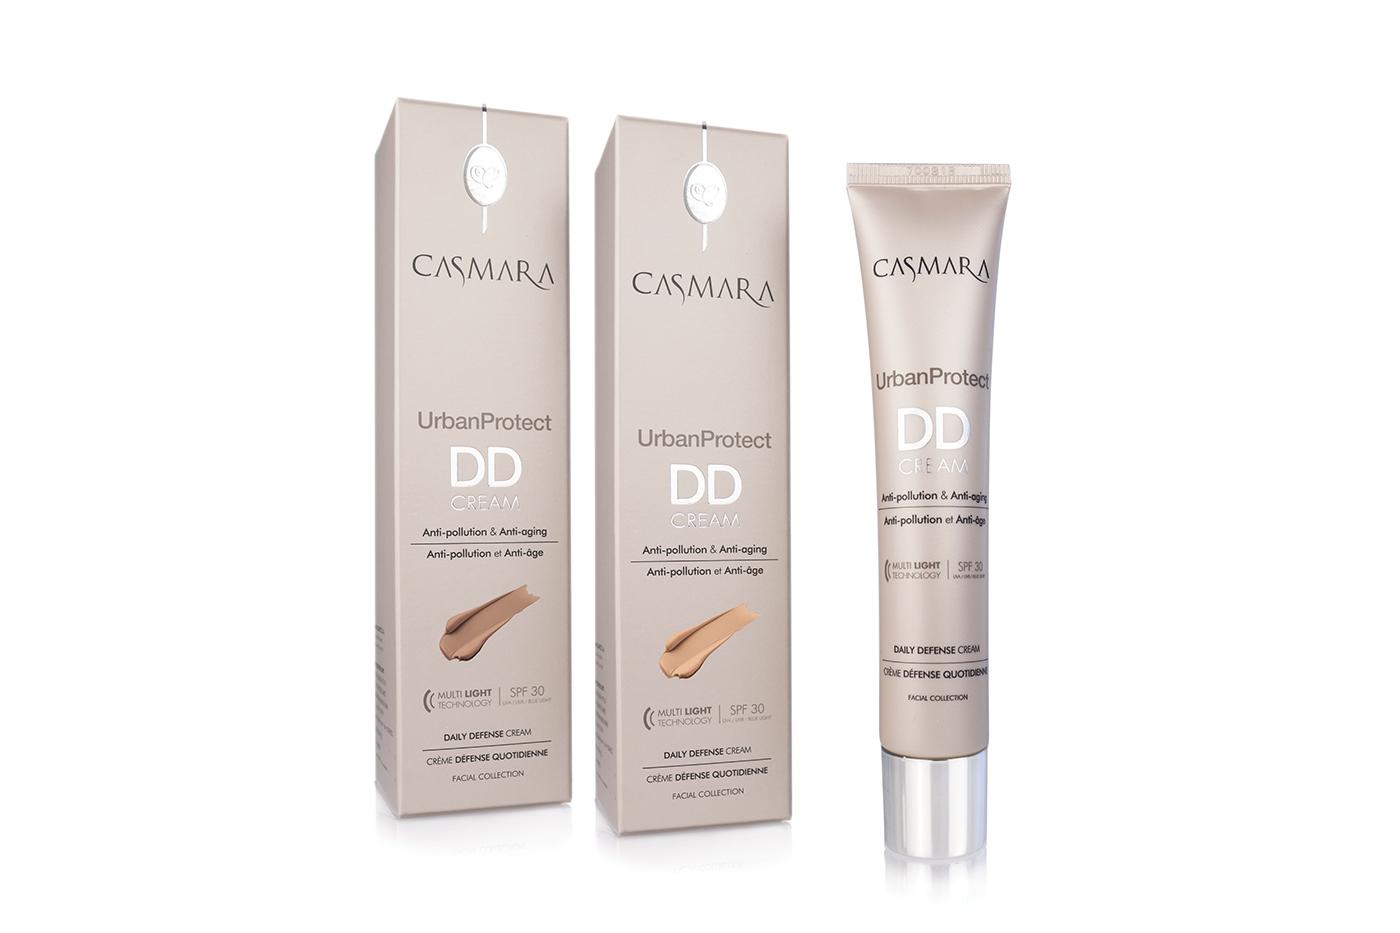 Skin-Prevention with Casmara's DD cream